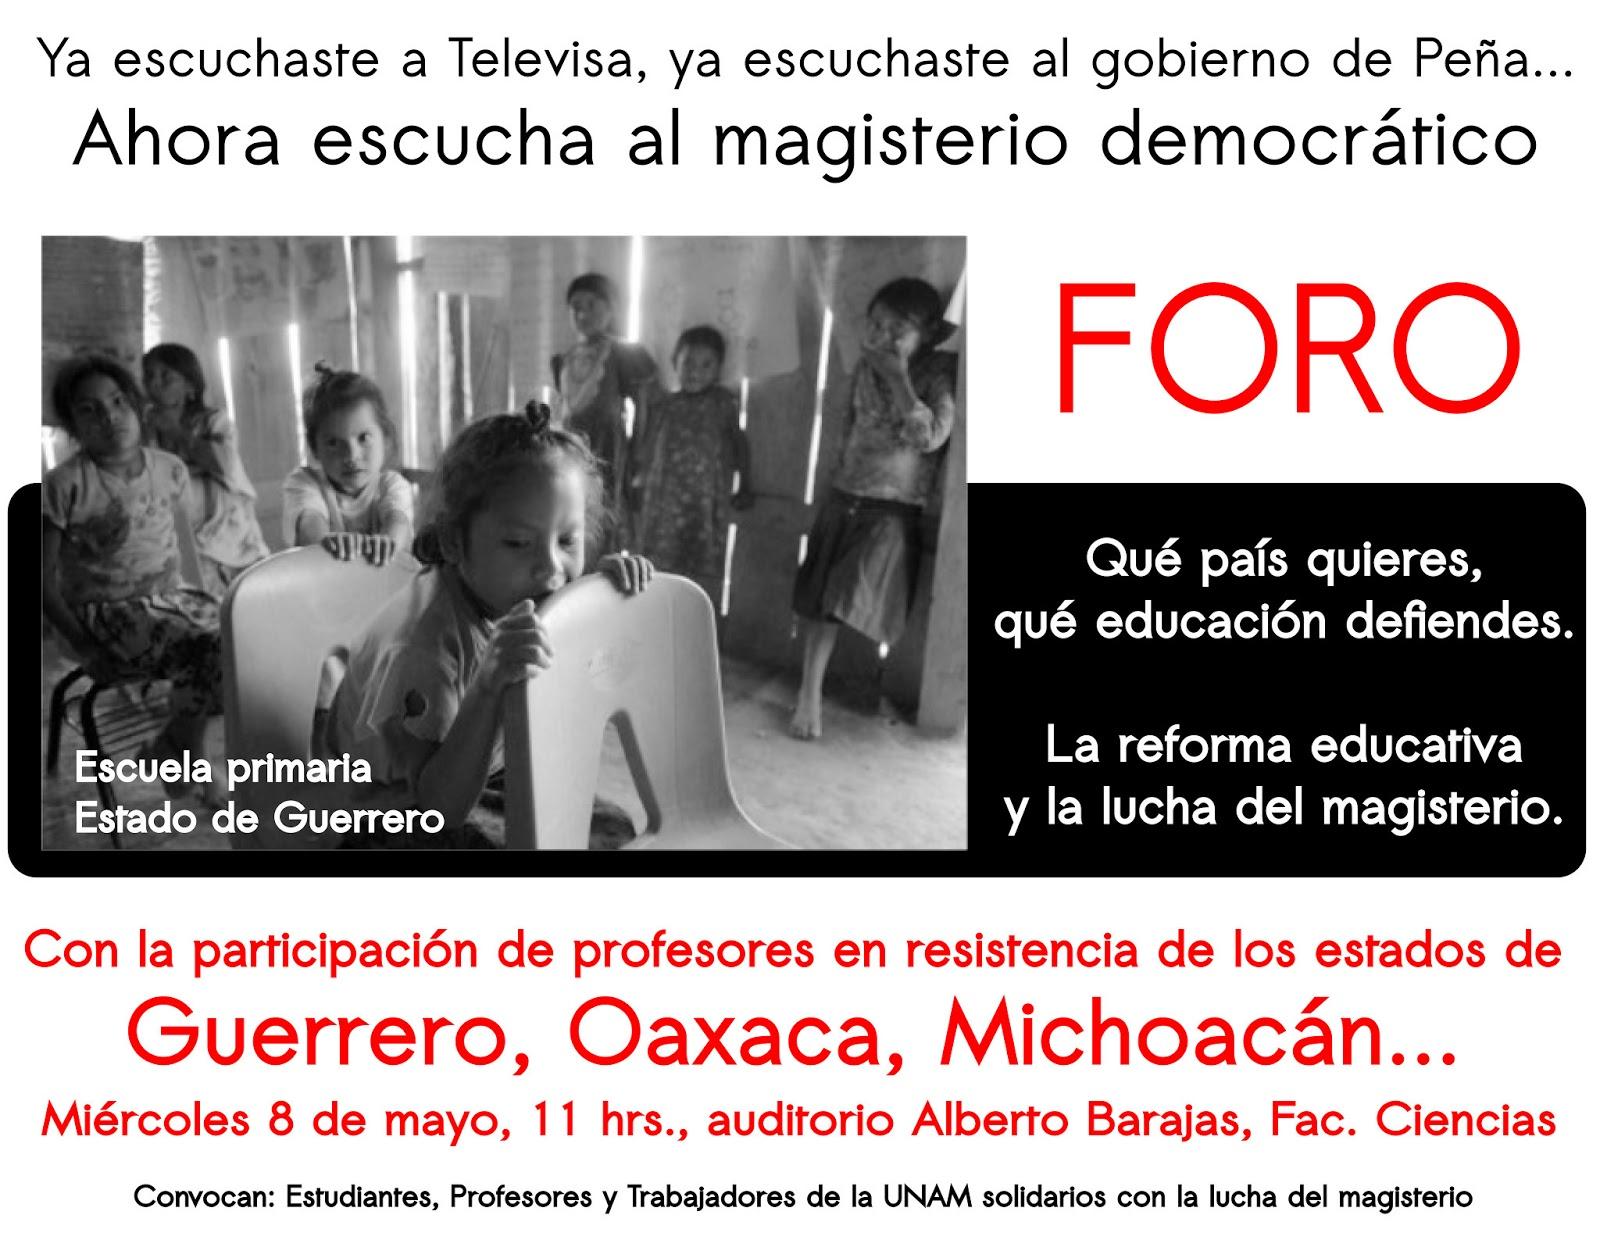 Magisterio hambriento: salario real de profesor de primaria p&uacuteblica del D.F.(TT: Teaching hunger: actual salaries of public primary school teachers in Mexico City): An article from: Siempre! Magdelena Galindo